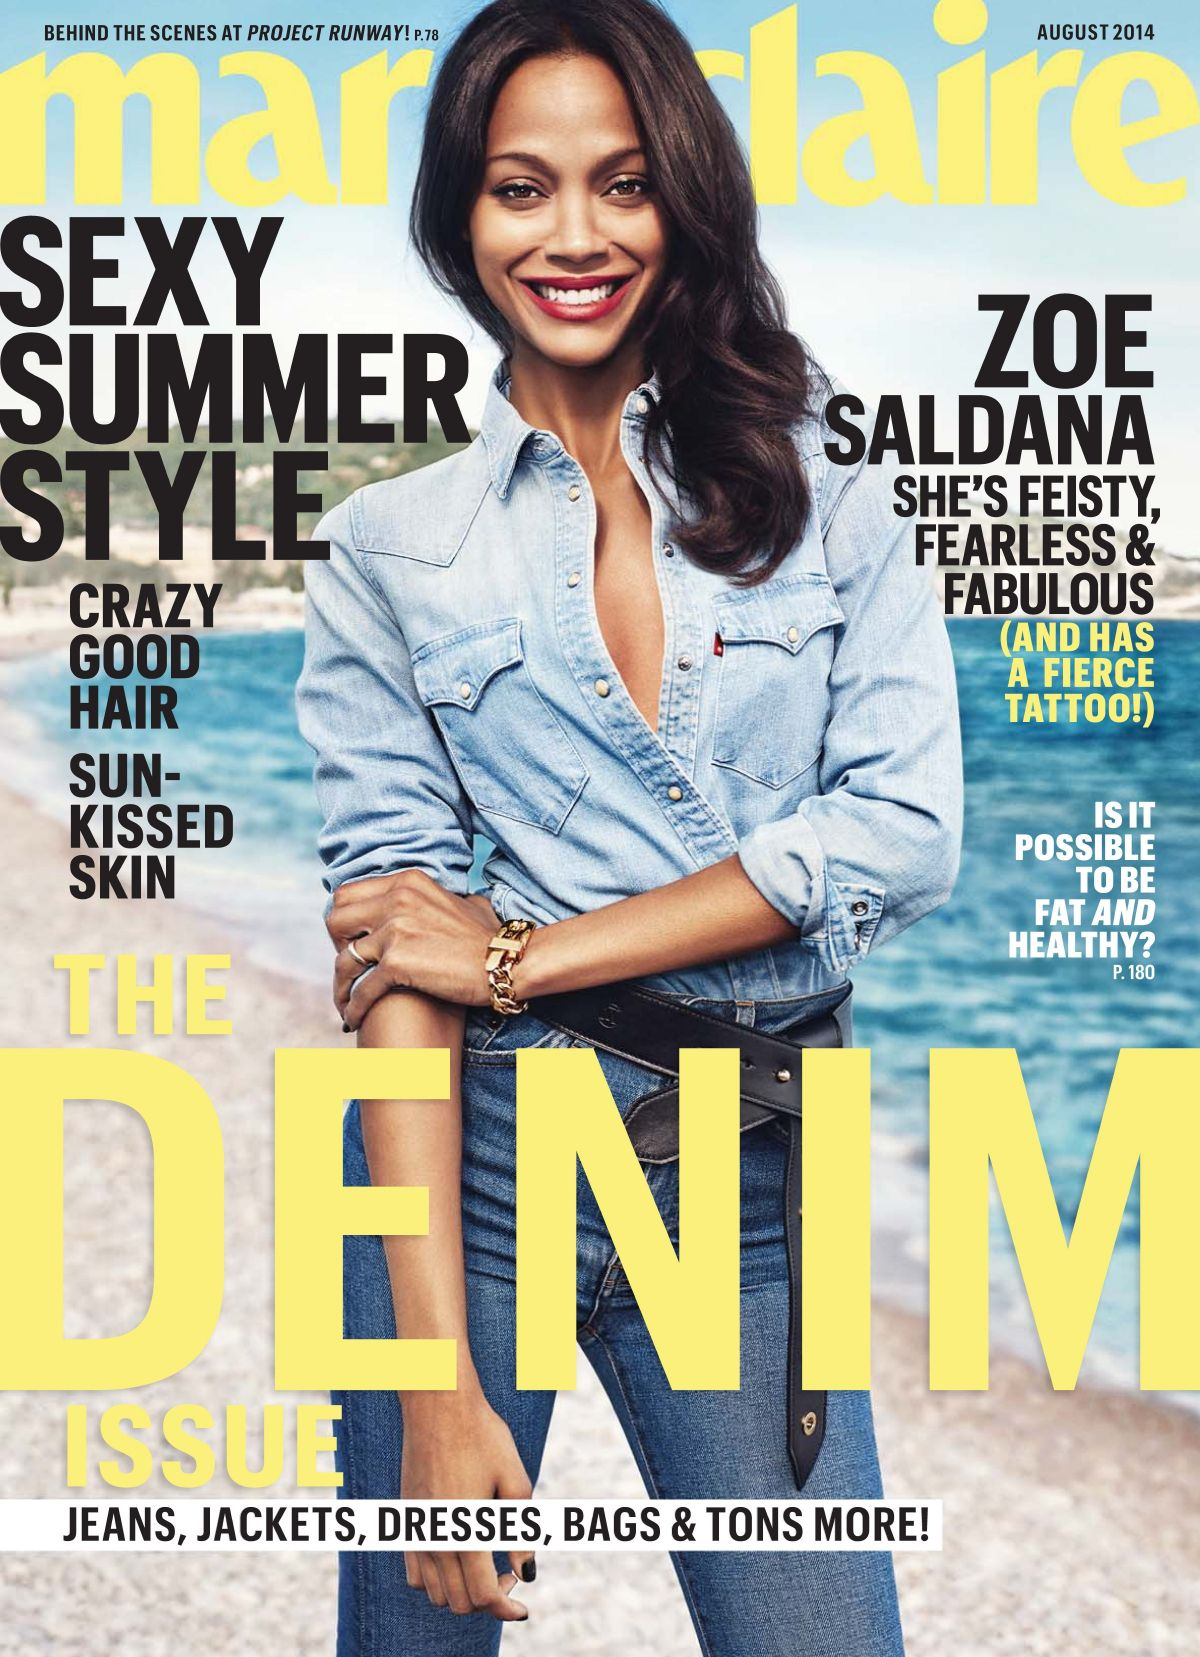 ZOE SALDANA in Marie Claire Magazine, August 2014 Issue